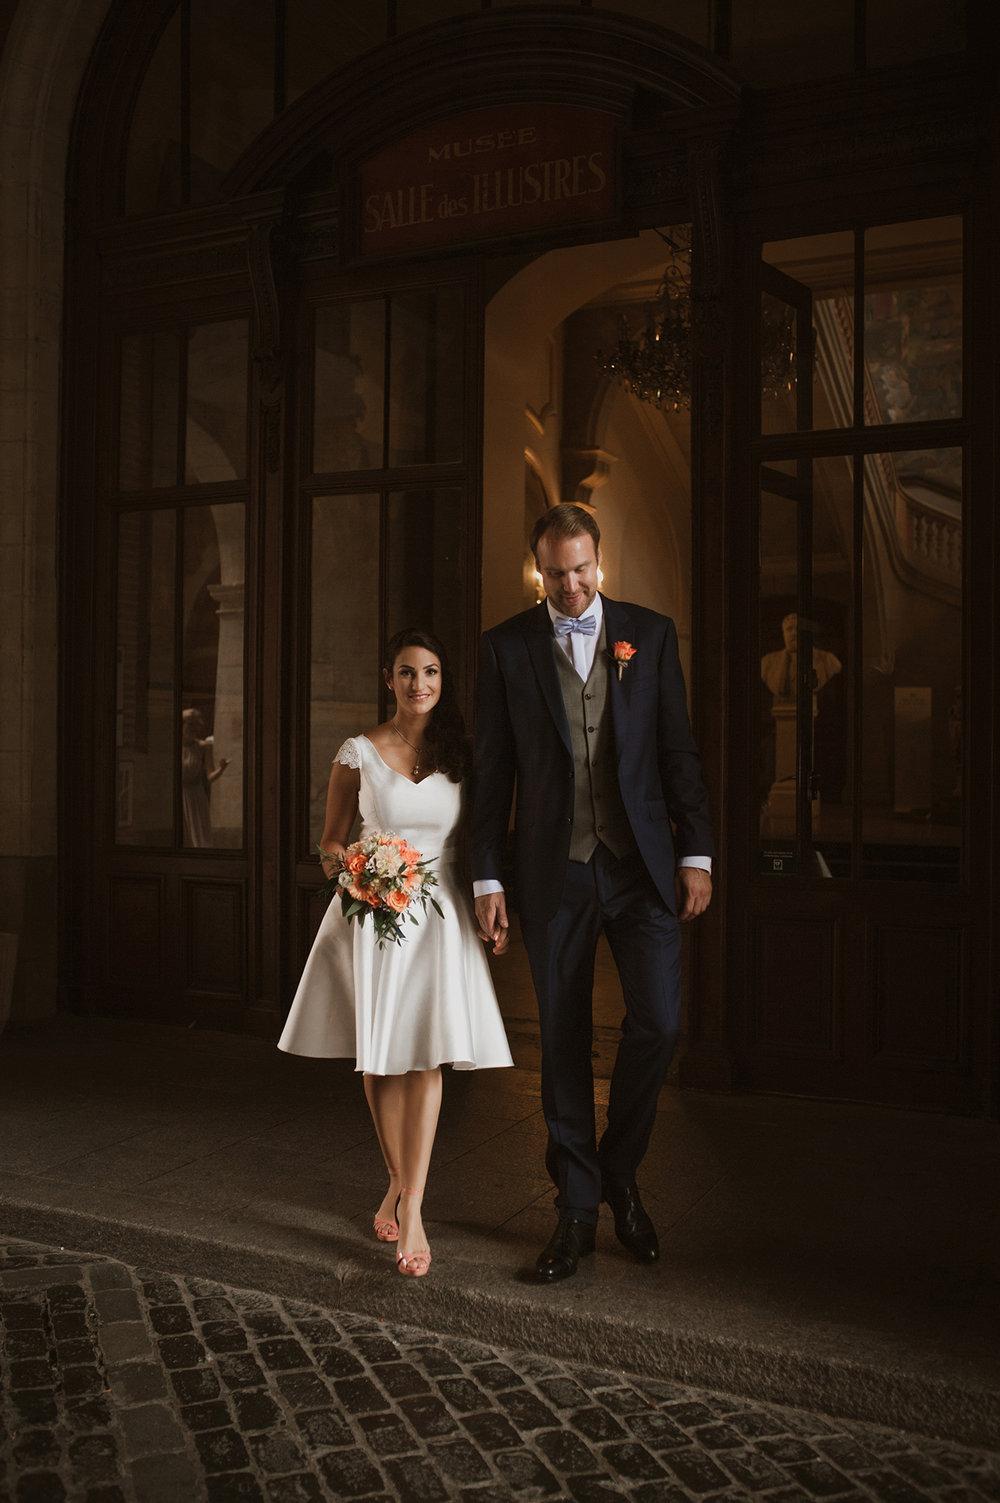 French Vineyard Wedding Toulouse | Emeris Photography Munich Wedding Photographer